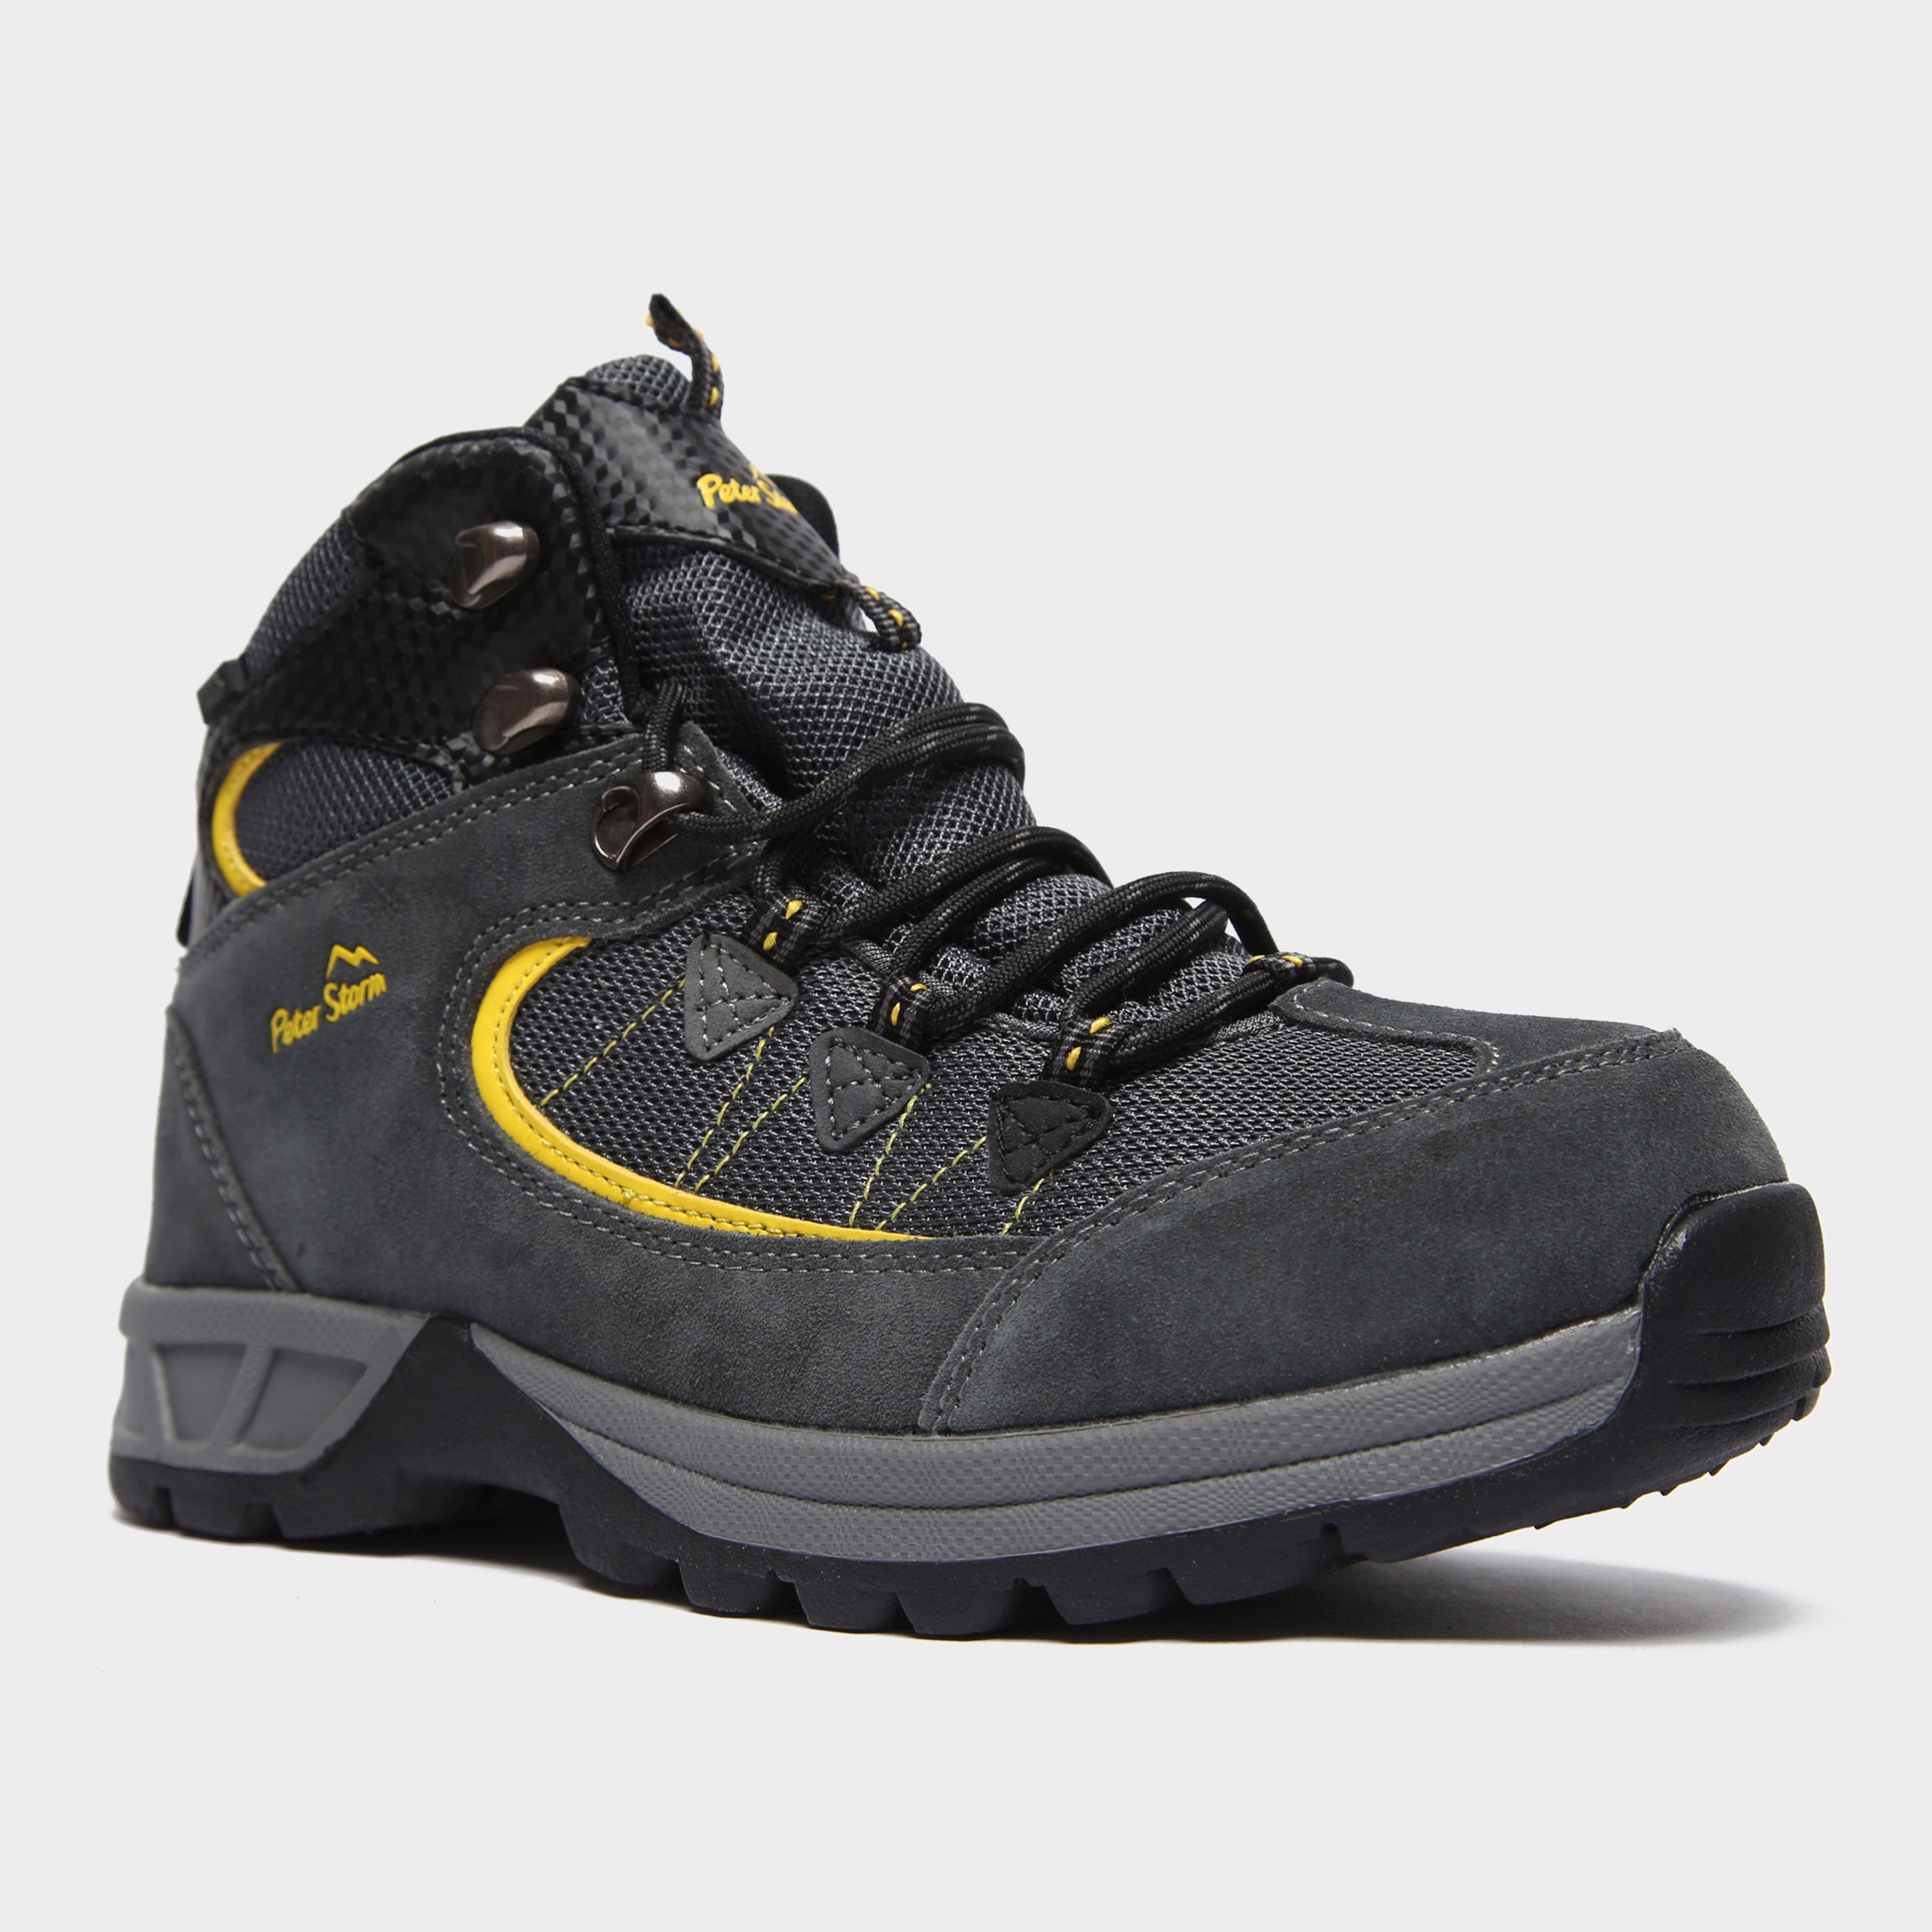 Peter Storm Kids Harwood II Mid Hiking Shoes